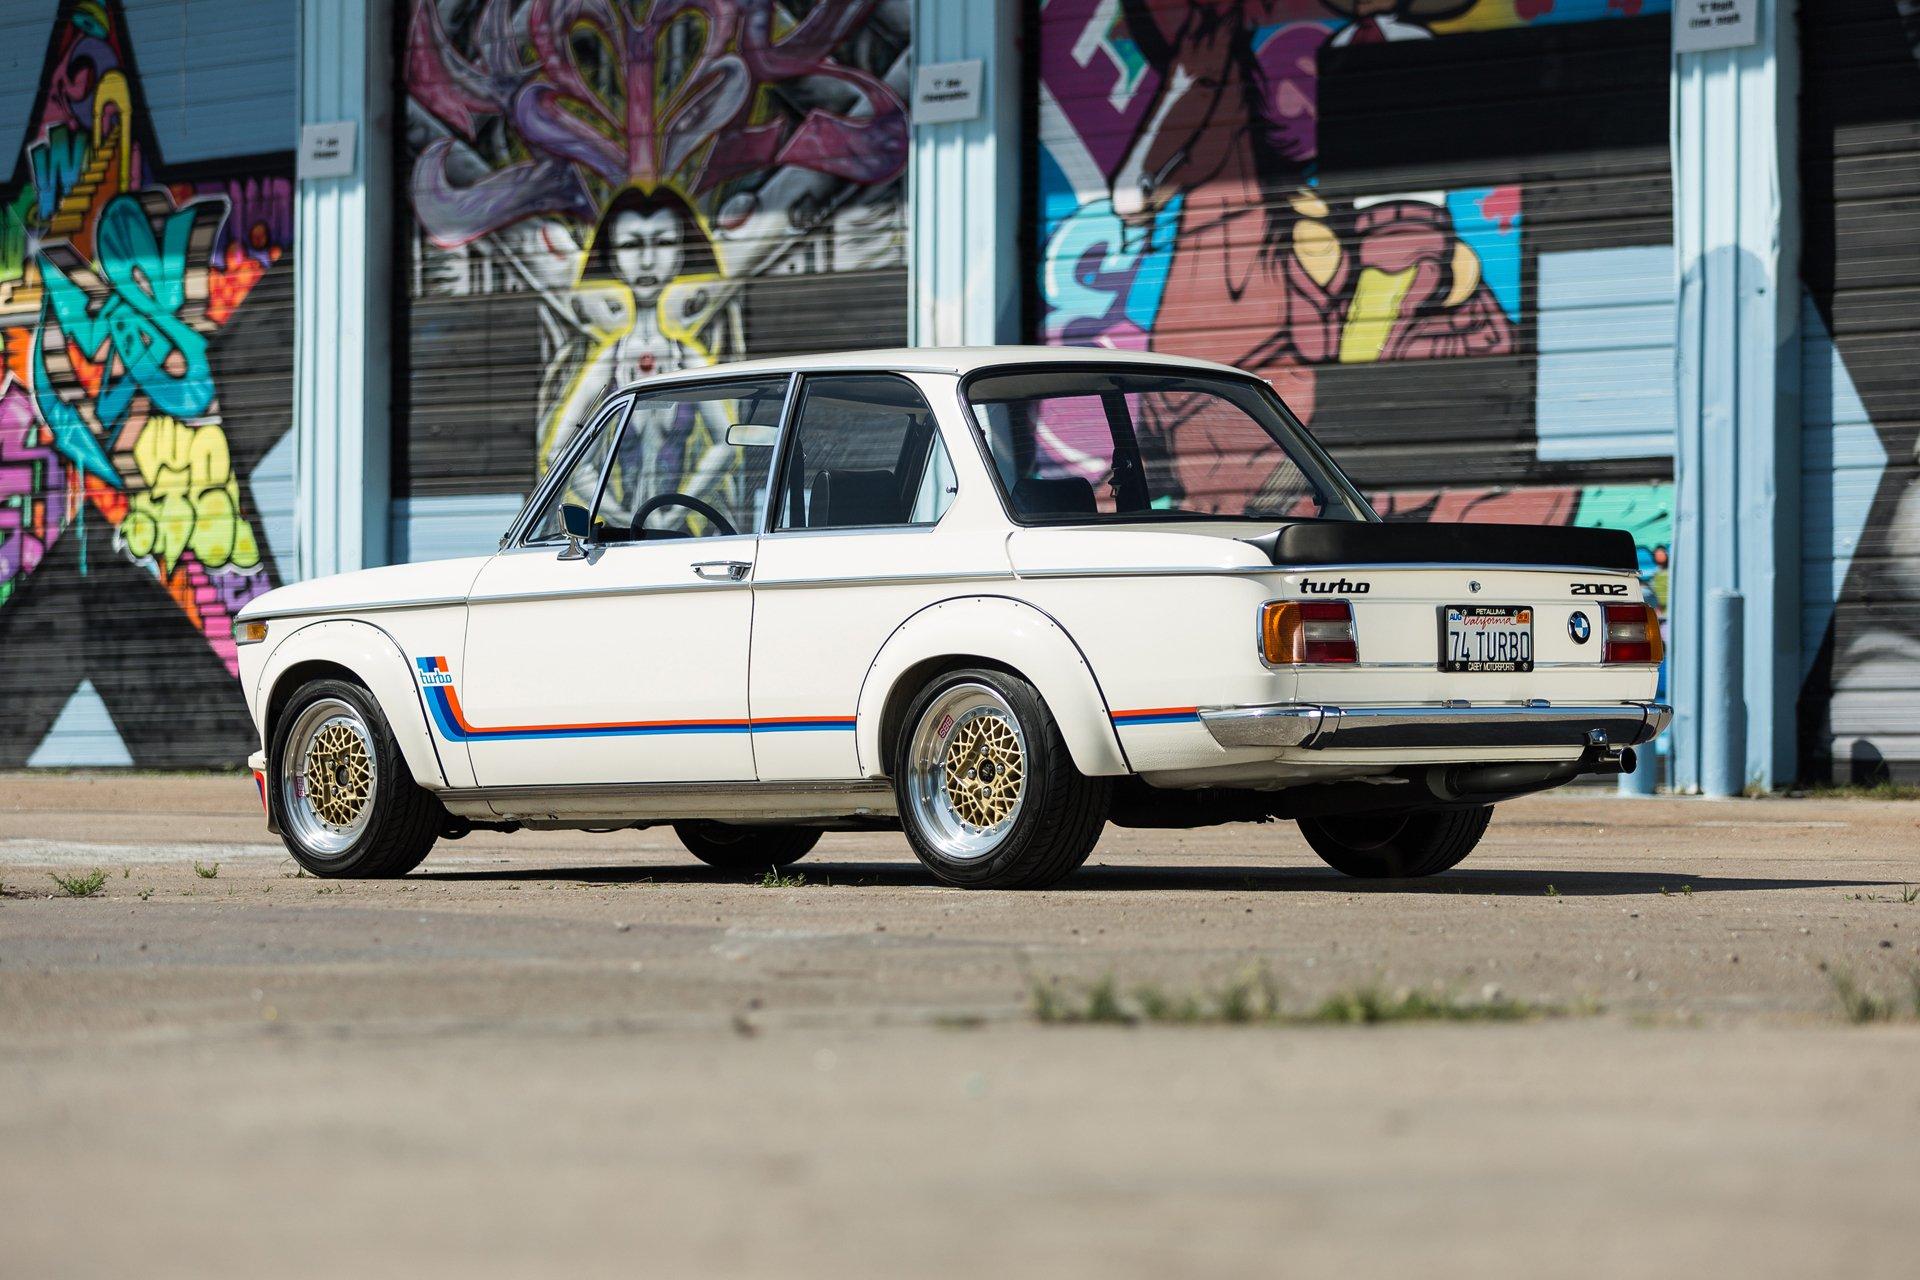 1974 Bmw 2002 Turbo For Sale 100894 Mcg